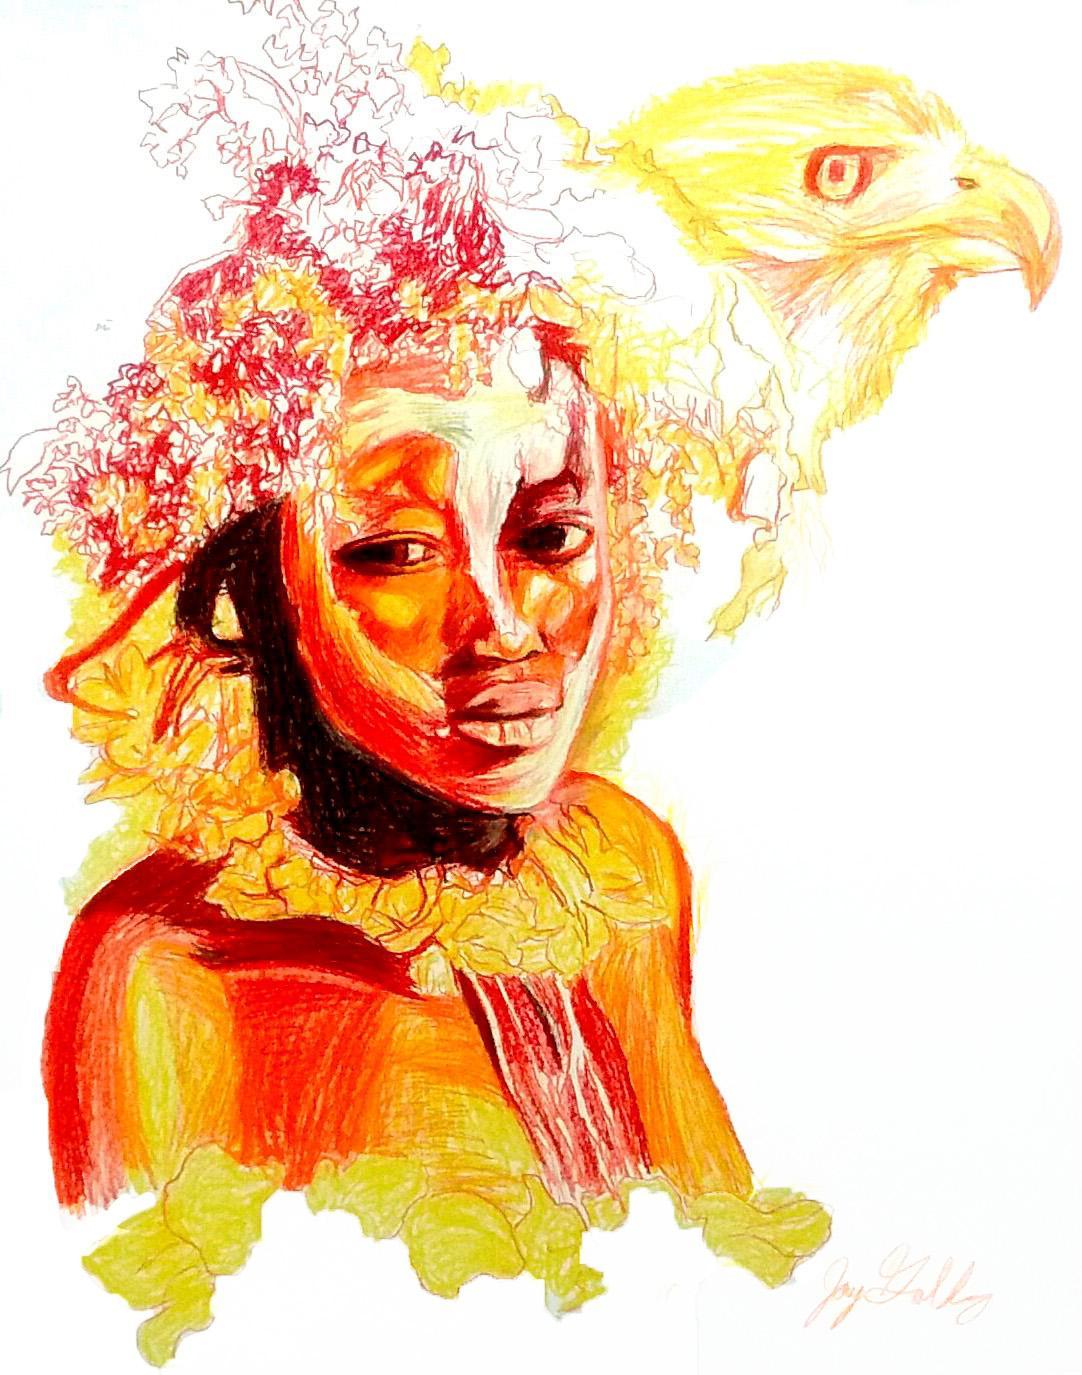 Fire (Hawk Spirit), 2017, figurative, yellow, orange, drawing, tribal, MarYah